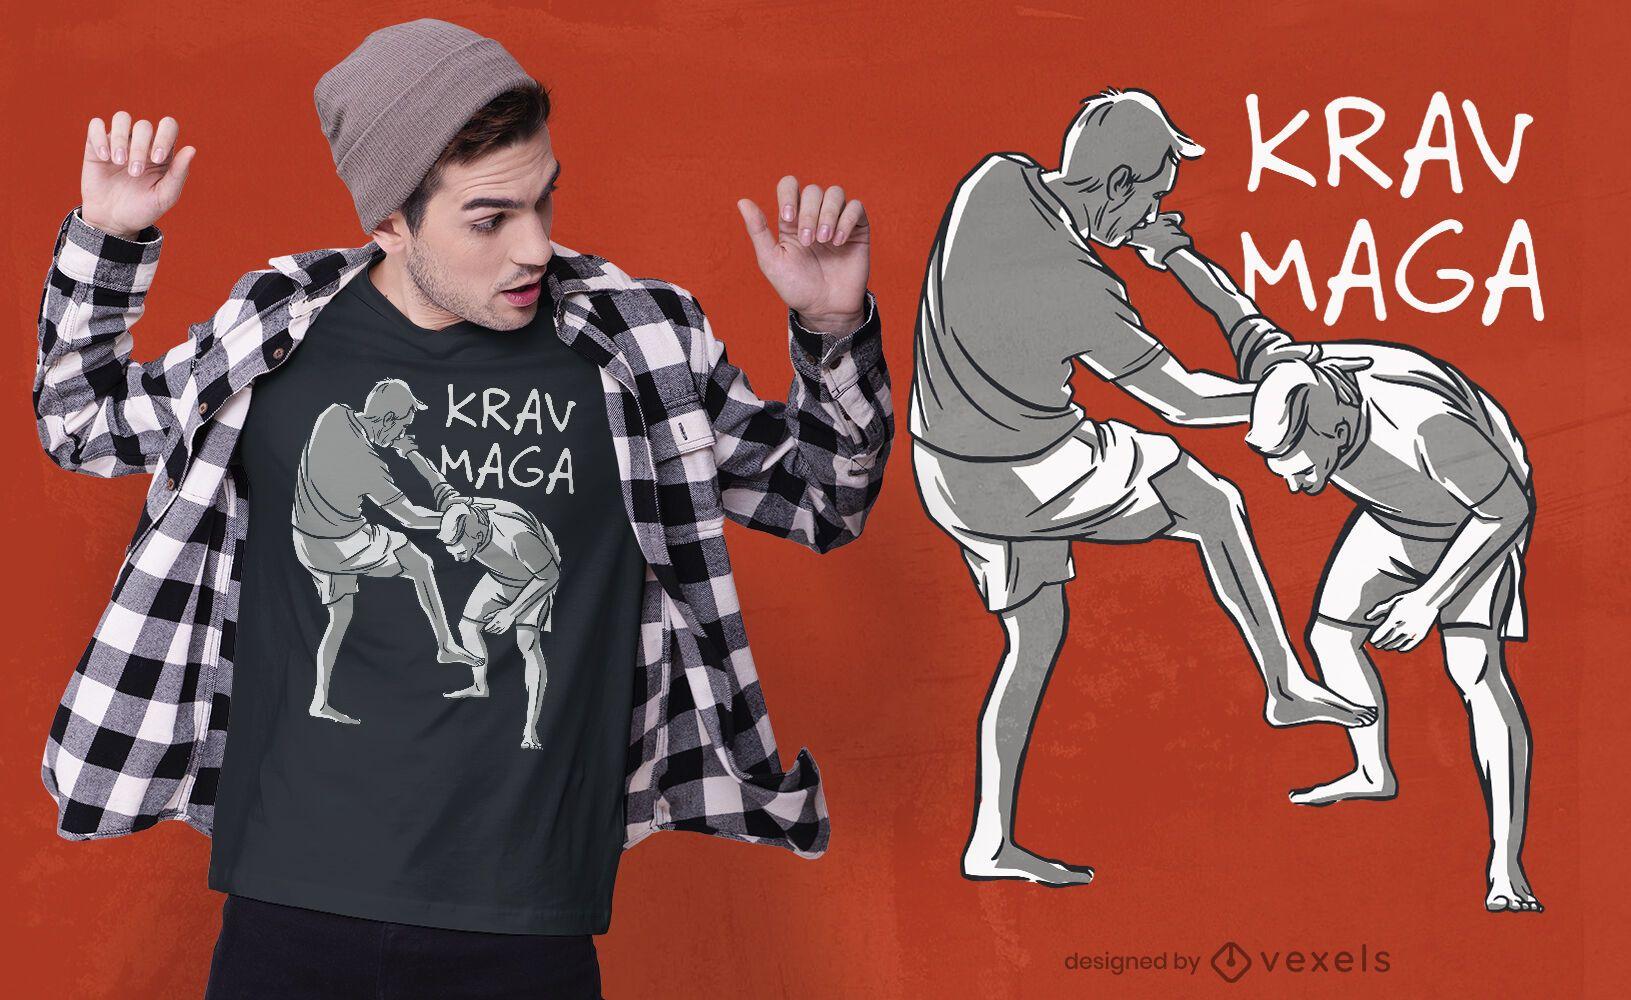 Martial arts krav maga t-shirt design